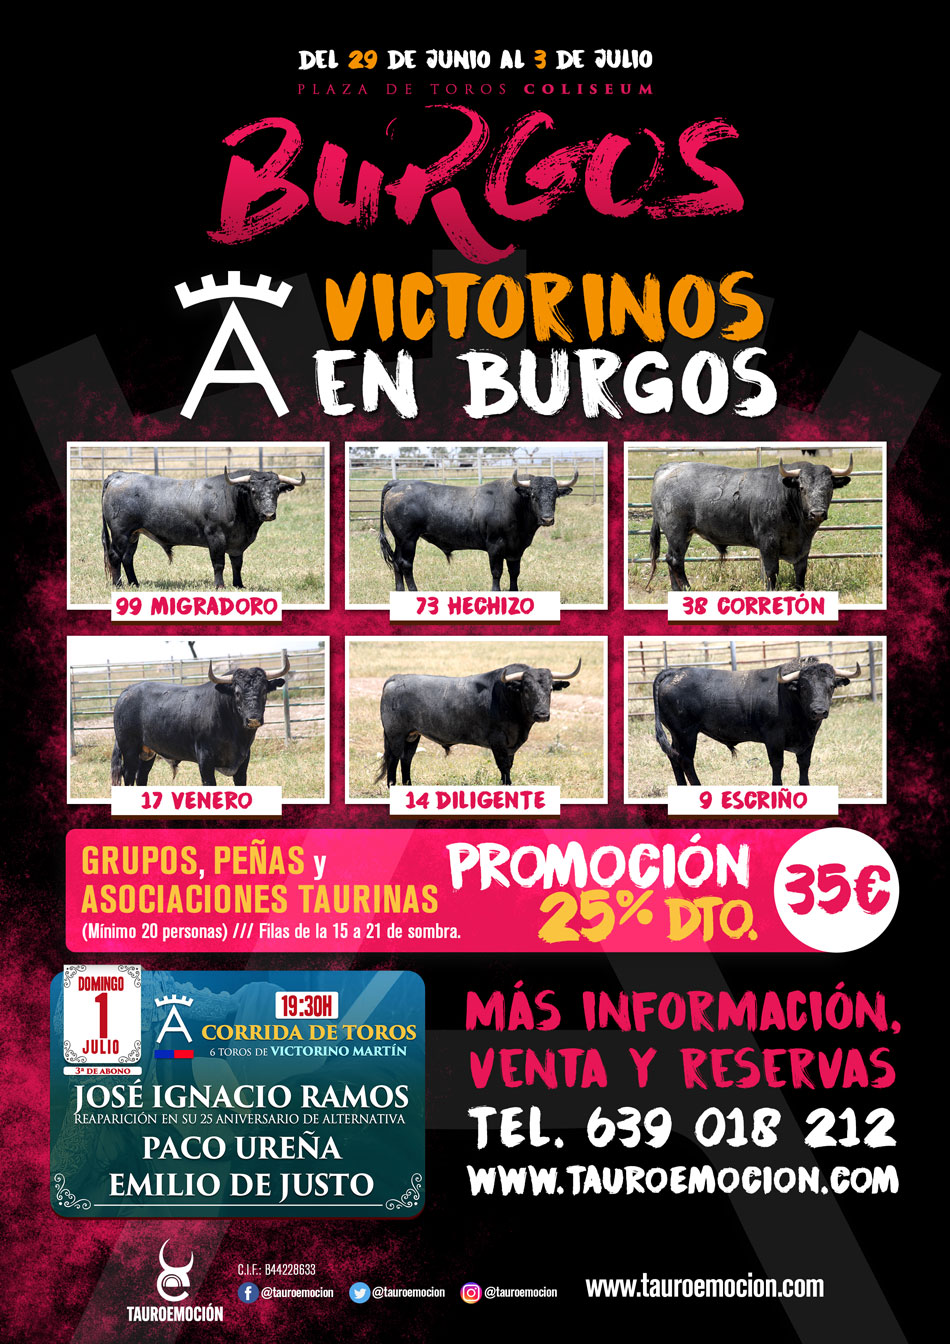 Cartel Victorinos BURGOS